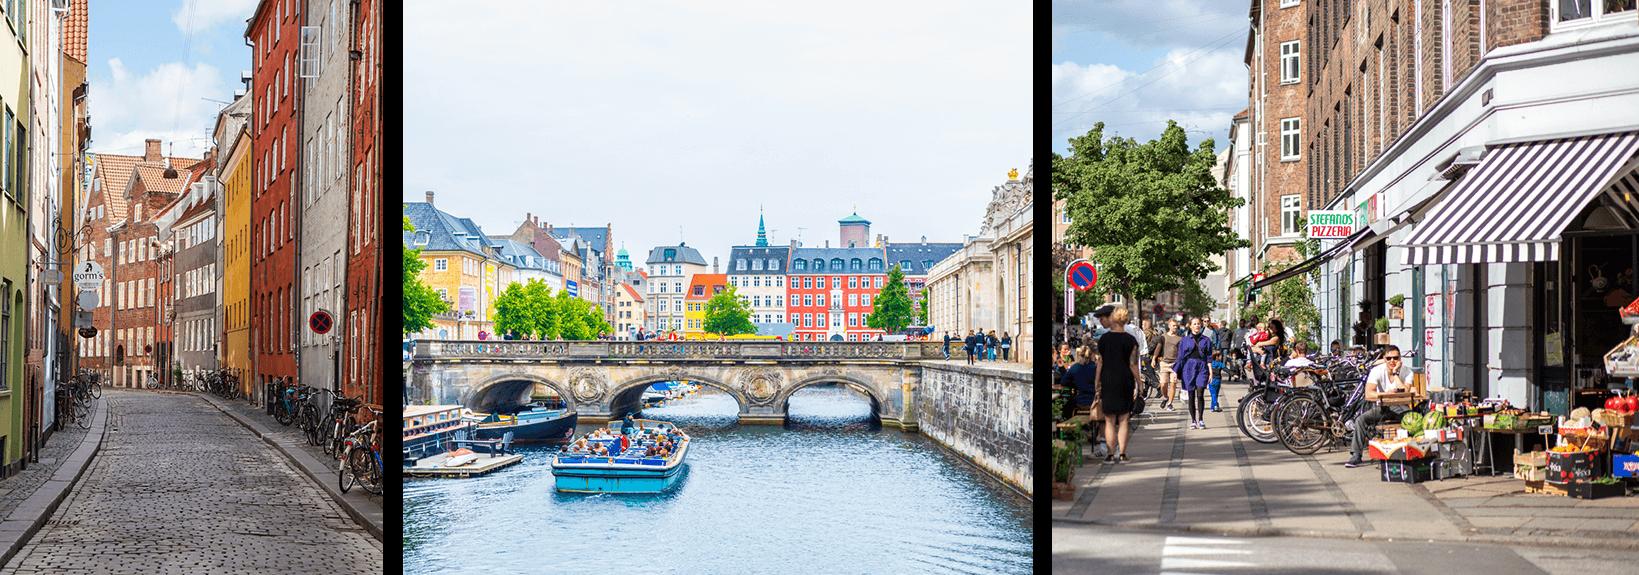 Copenhagen sightseeing locations